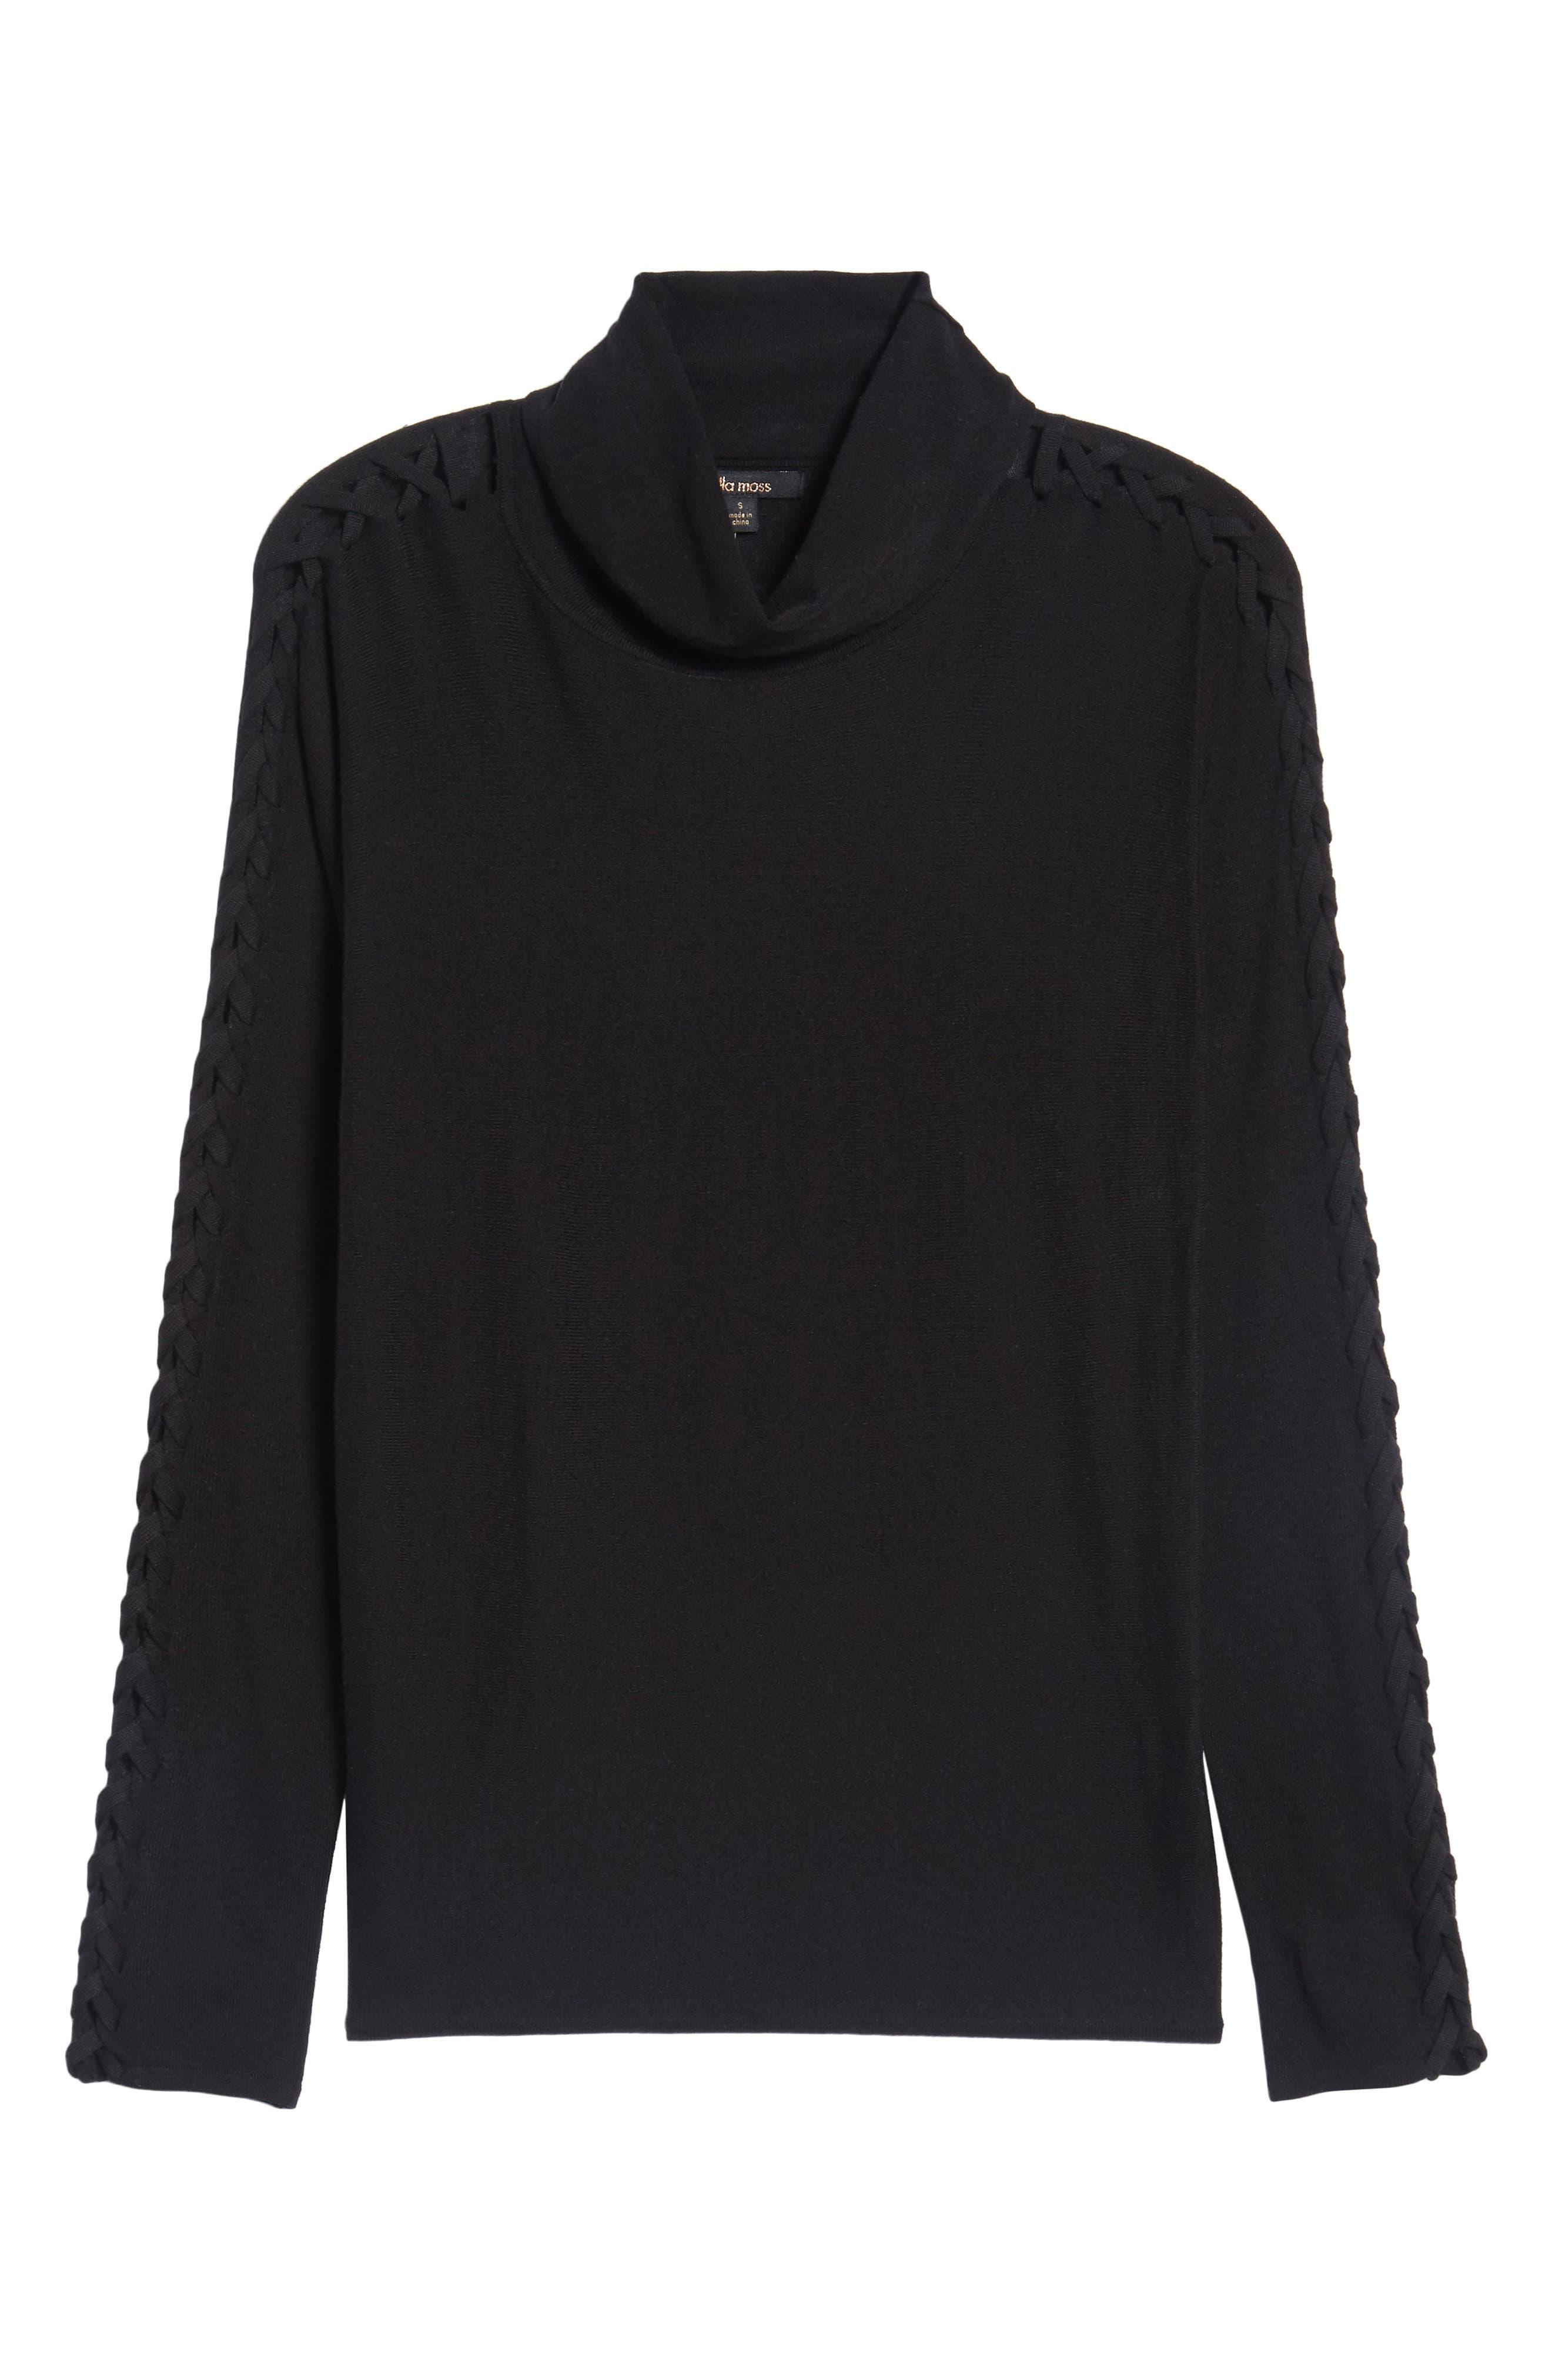 Victoire Turtleneck Sweater,                             Alternate thumbnail 6, color,                             Black